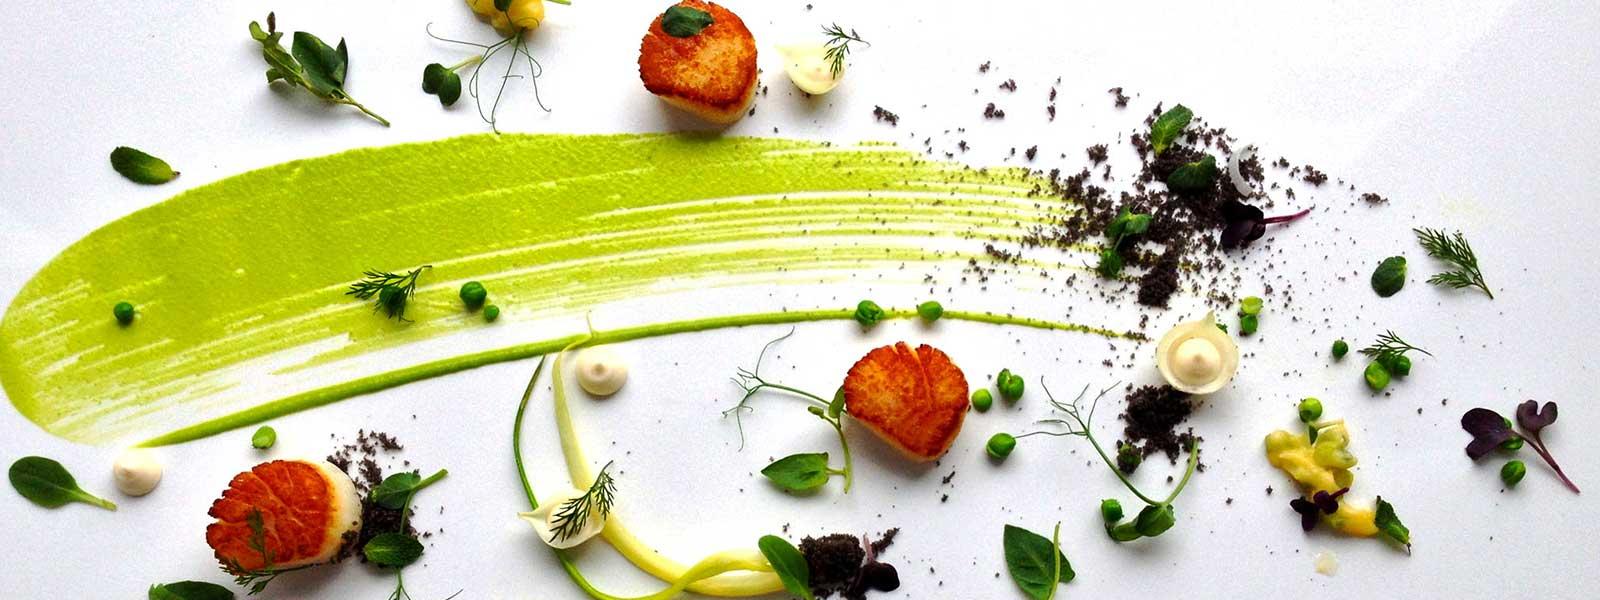 Culinary Tour of Turkey